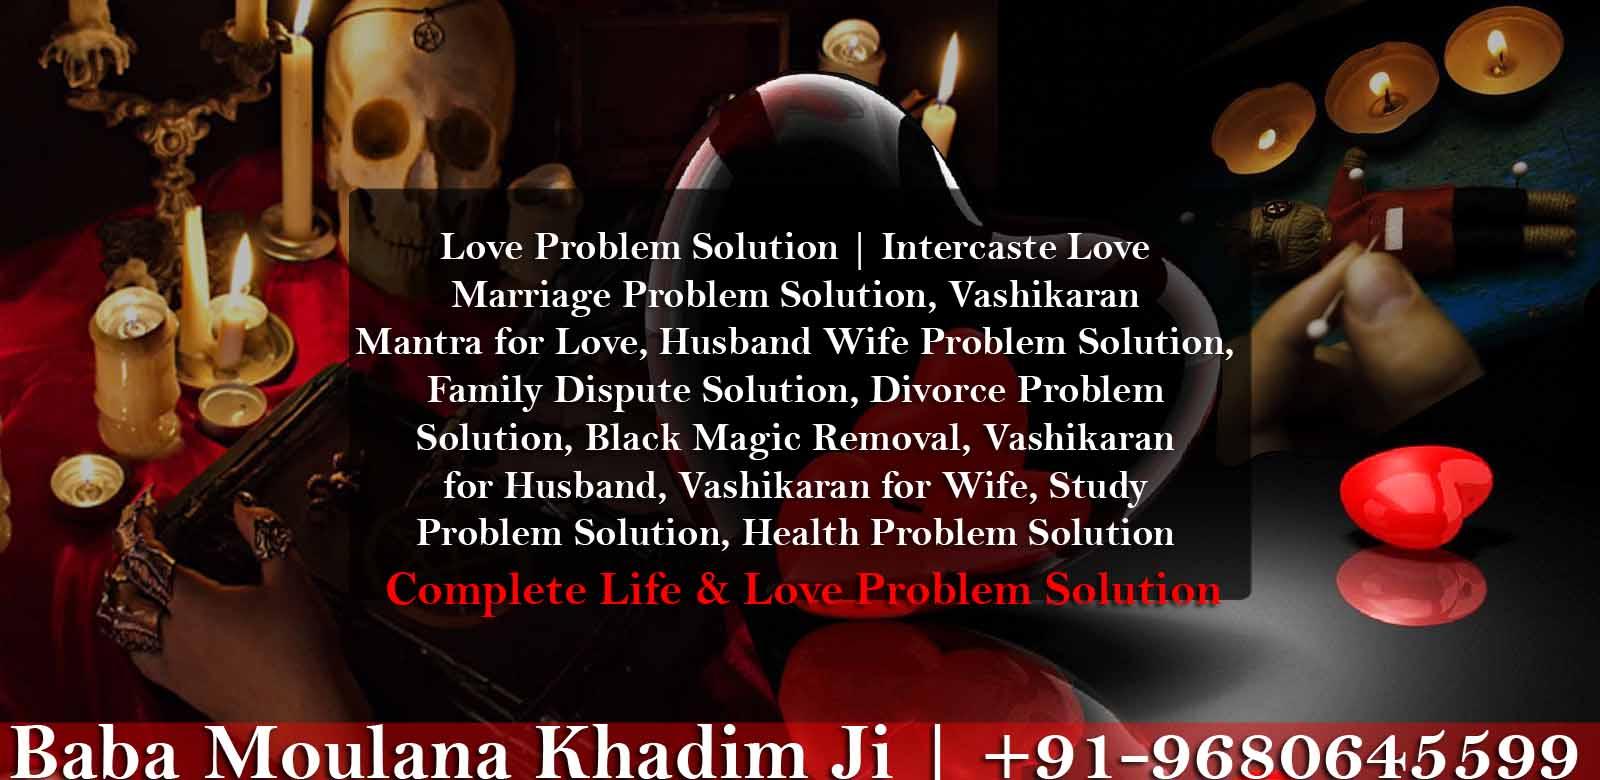 Love Problem Solution